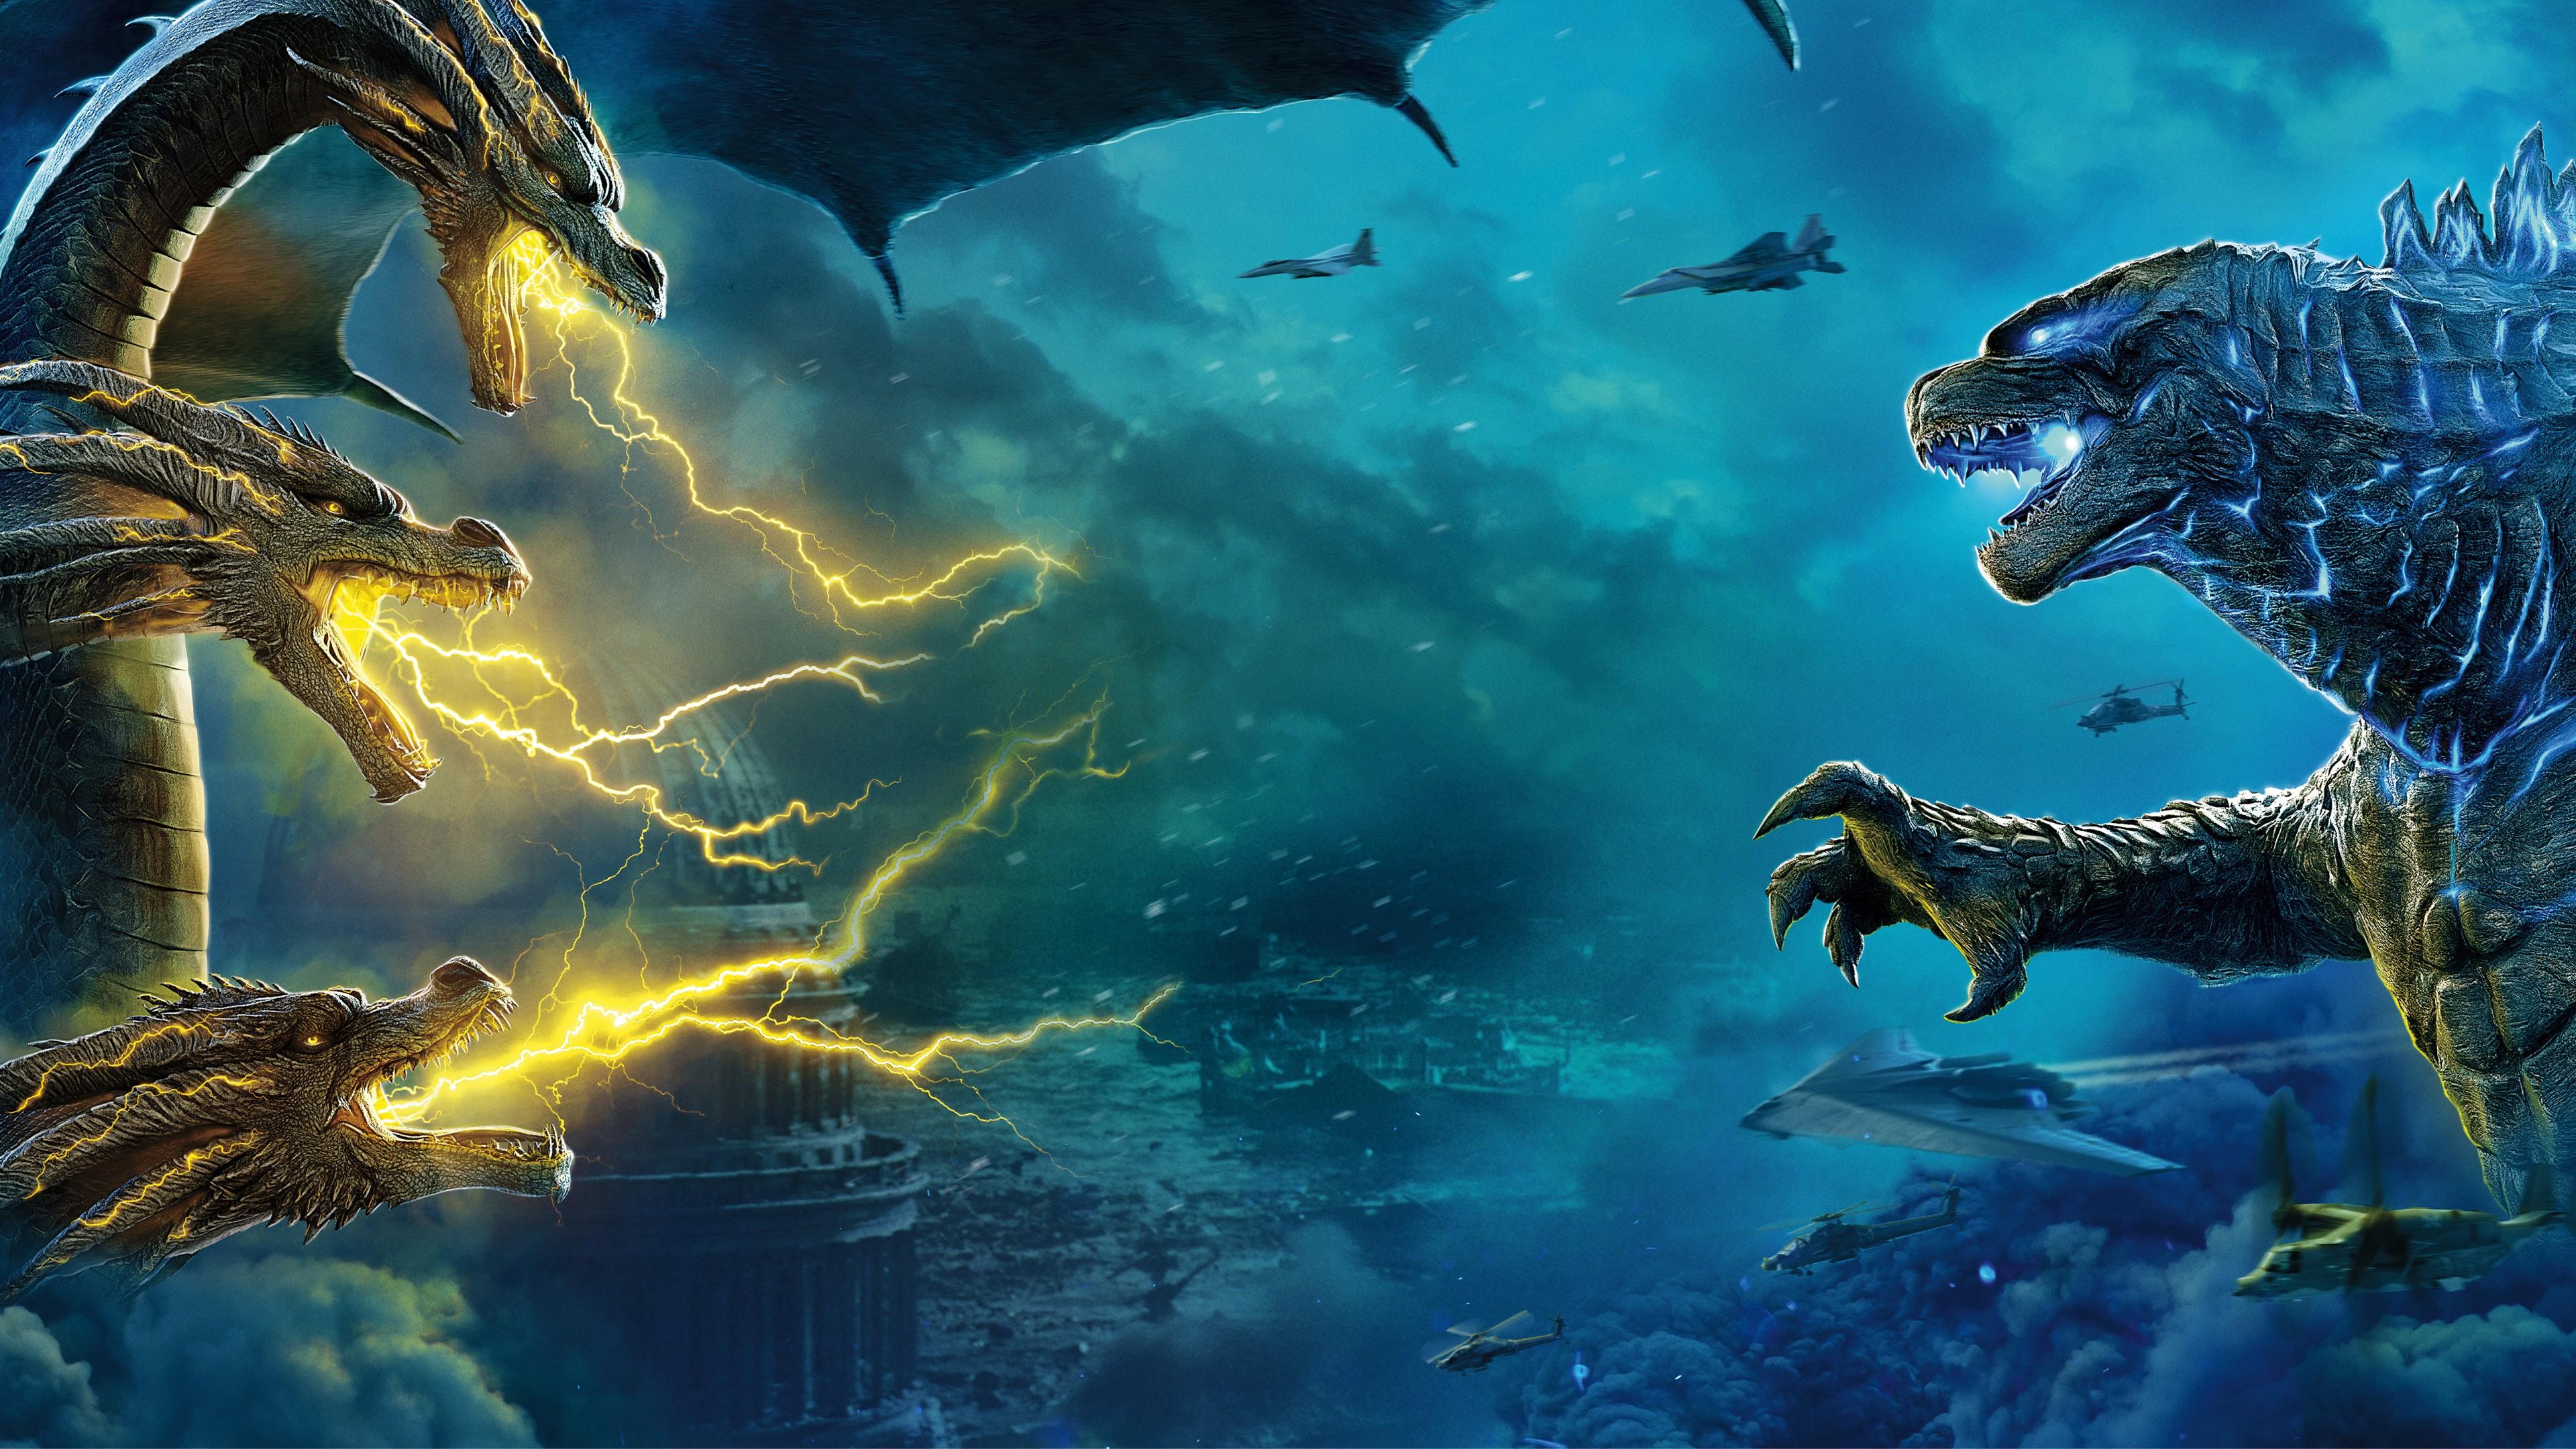 Harry Potter 3d Wallpaper Download Godzilla Vs King Ghidorah 5k Wallpapers Hd Wallpapers